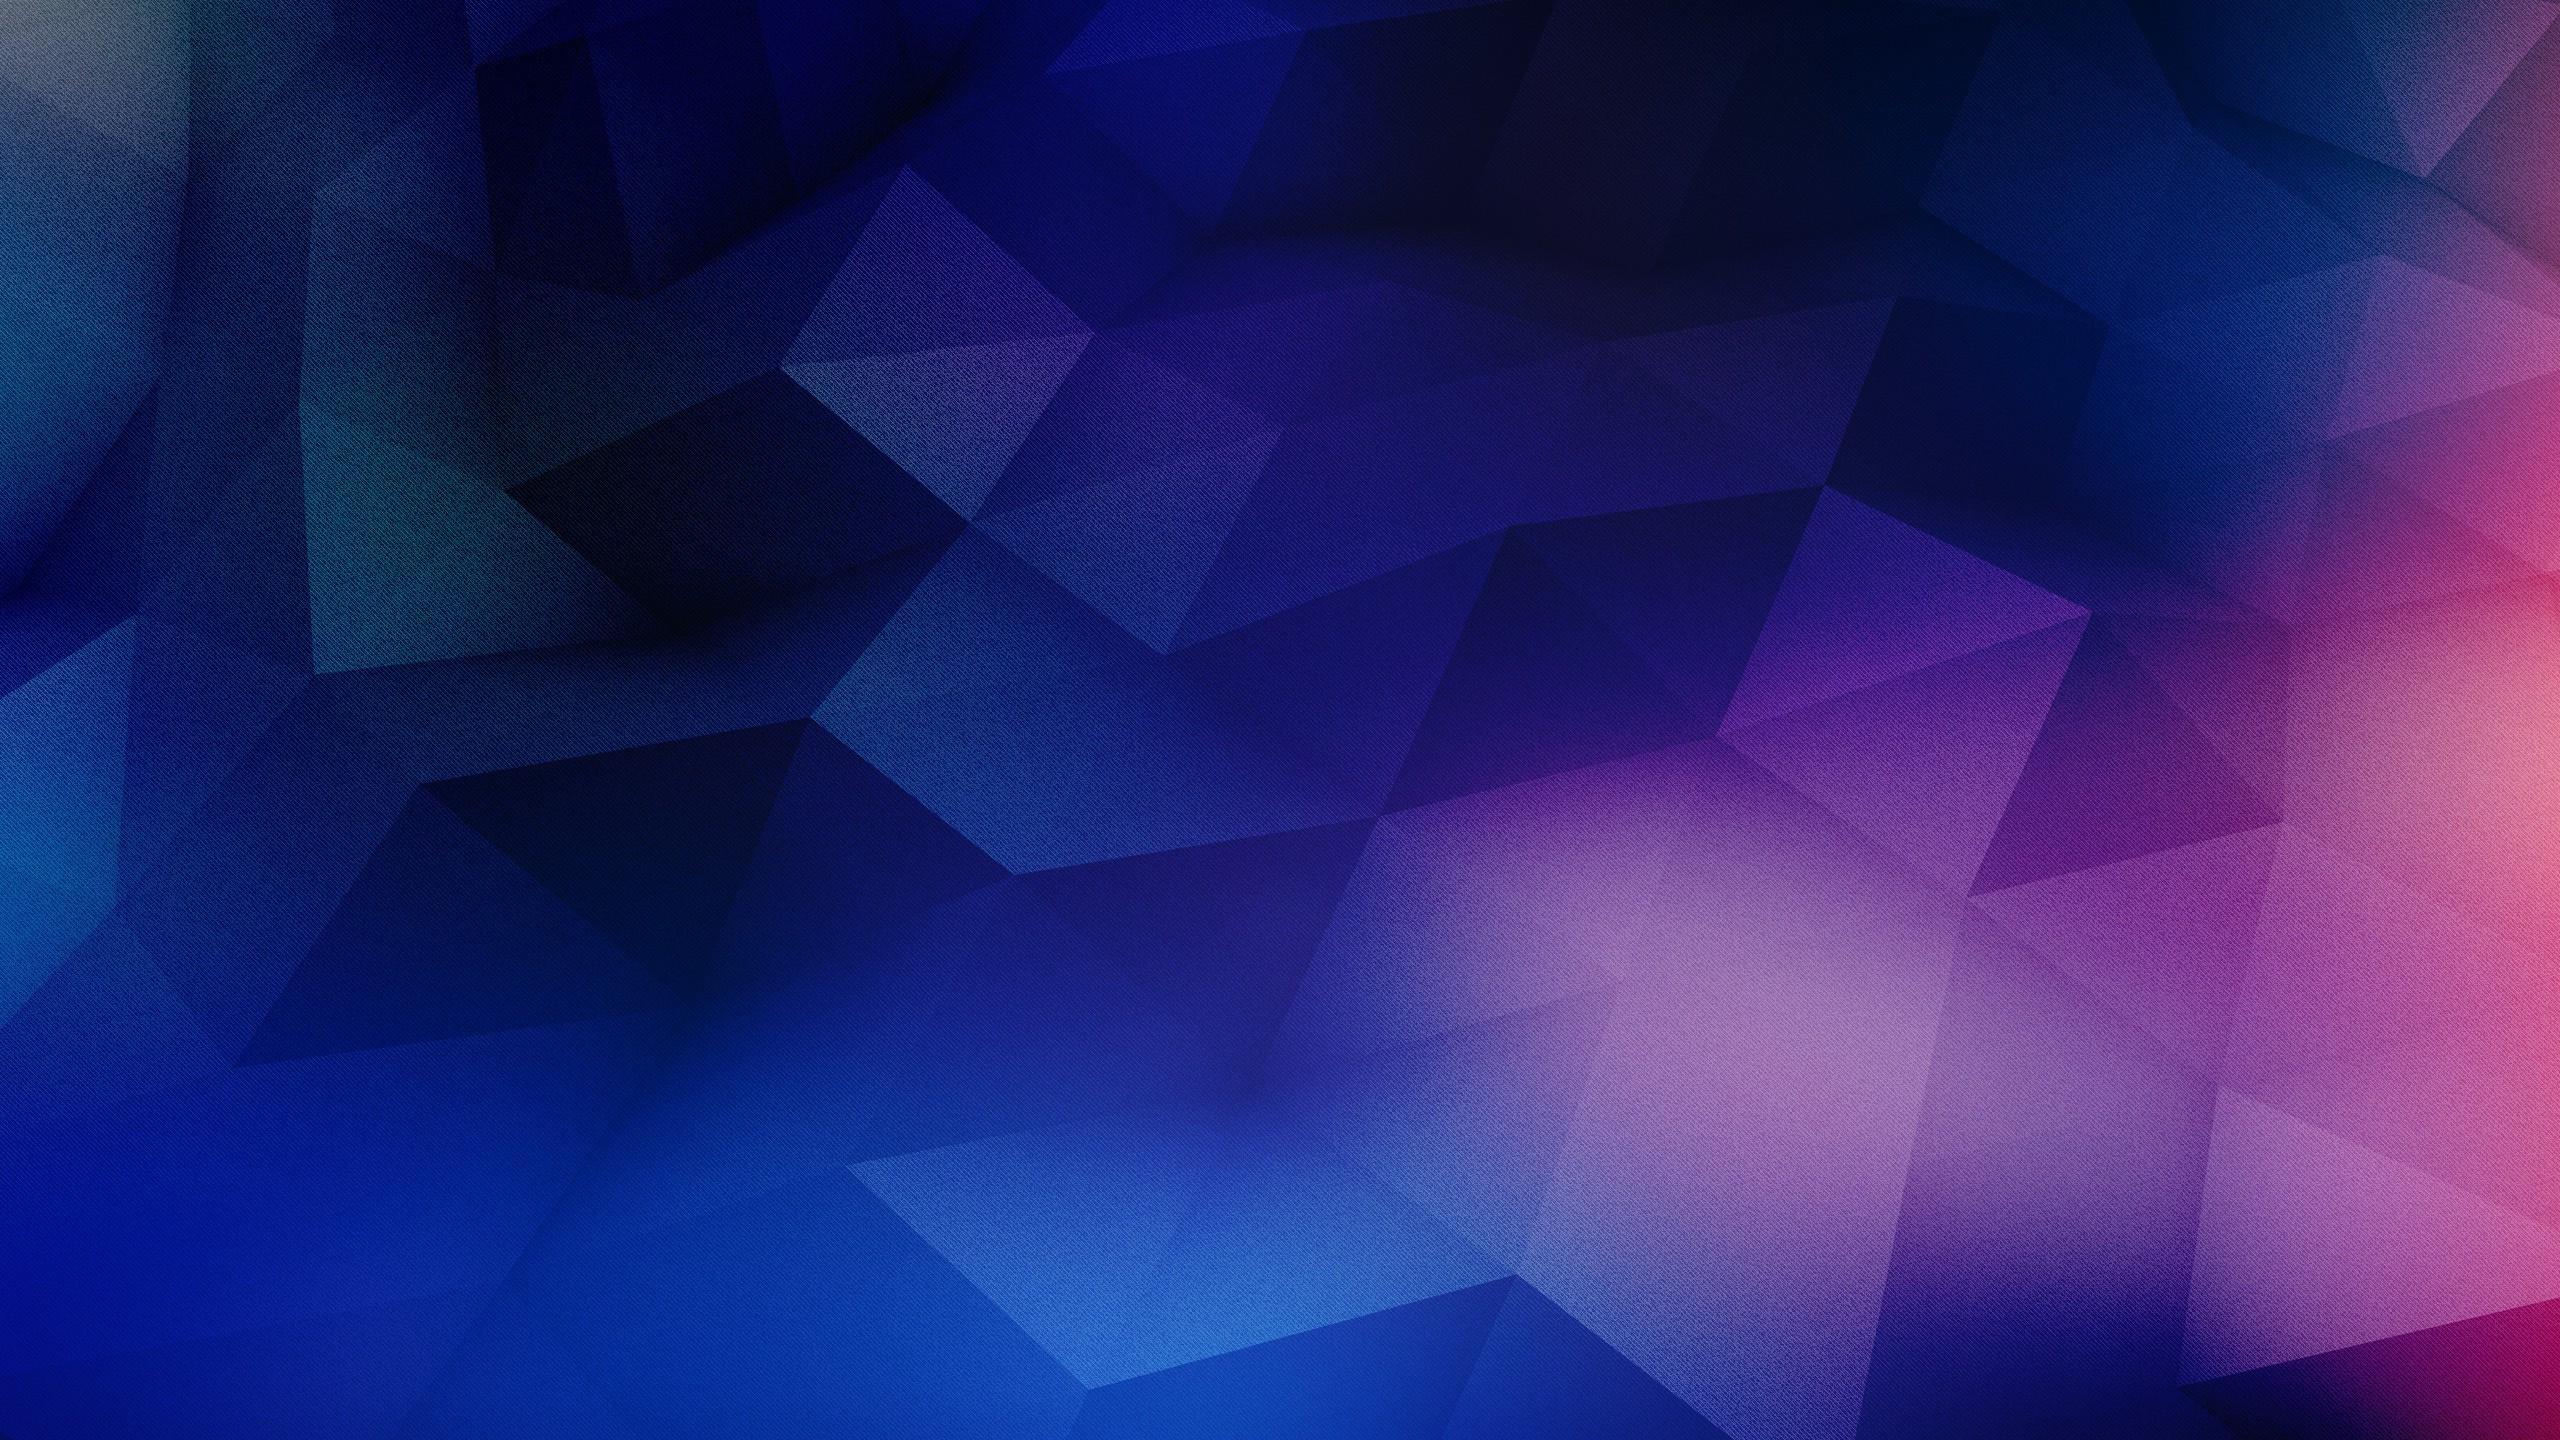 25 HD Polygon Wallpapers #6891